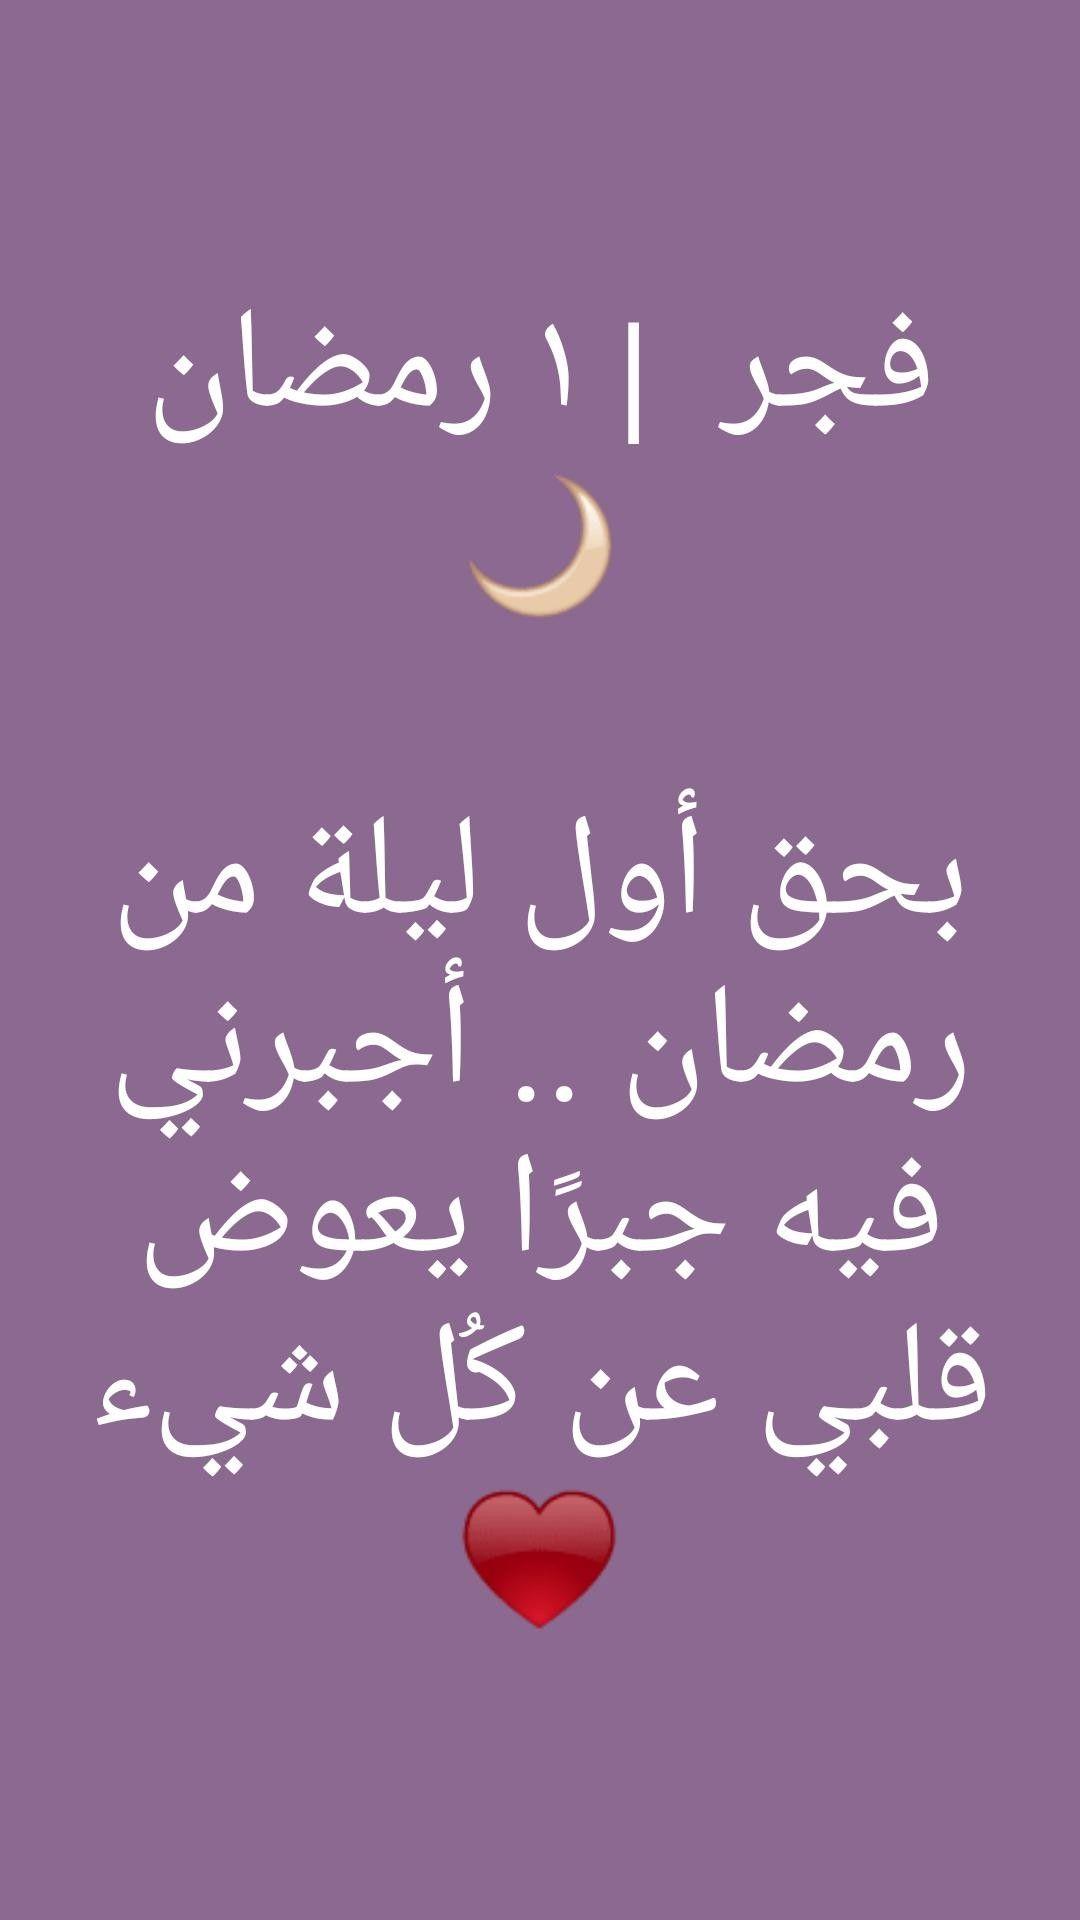 Pin By The Way To Live On Allah The Omniscient Ramadan Good Morning Arabic Ramadan Decorations